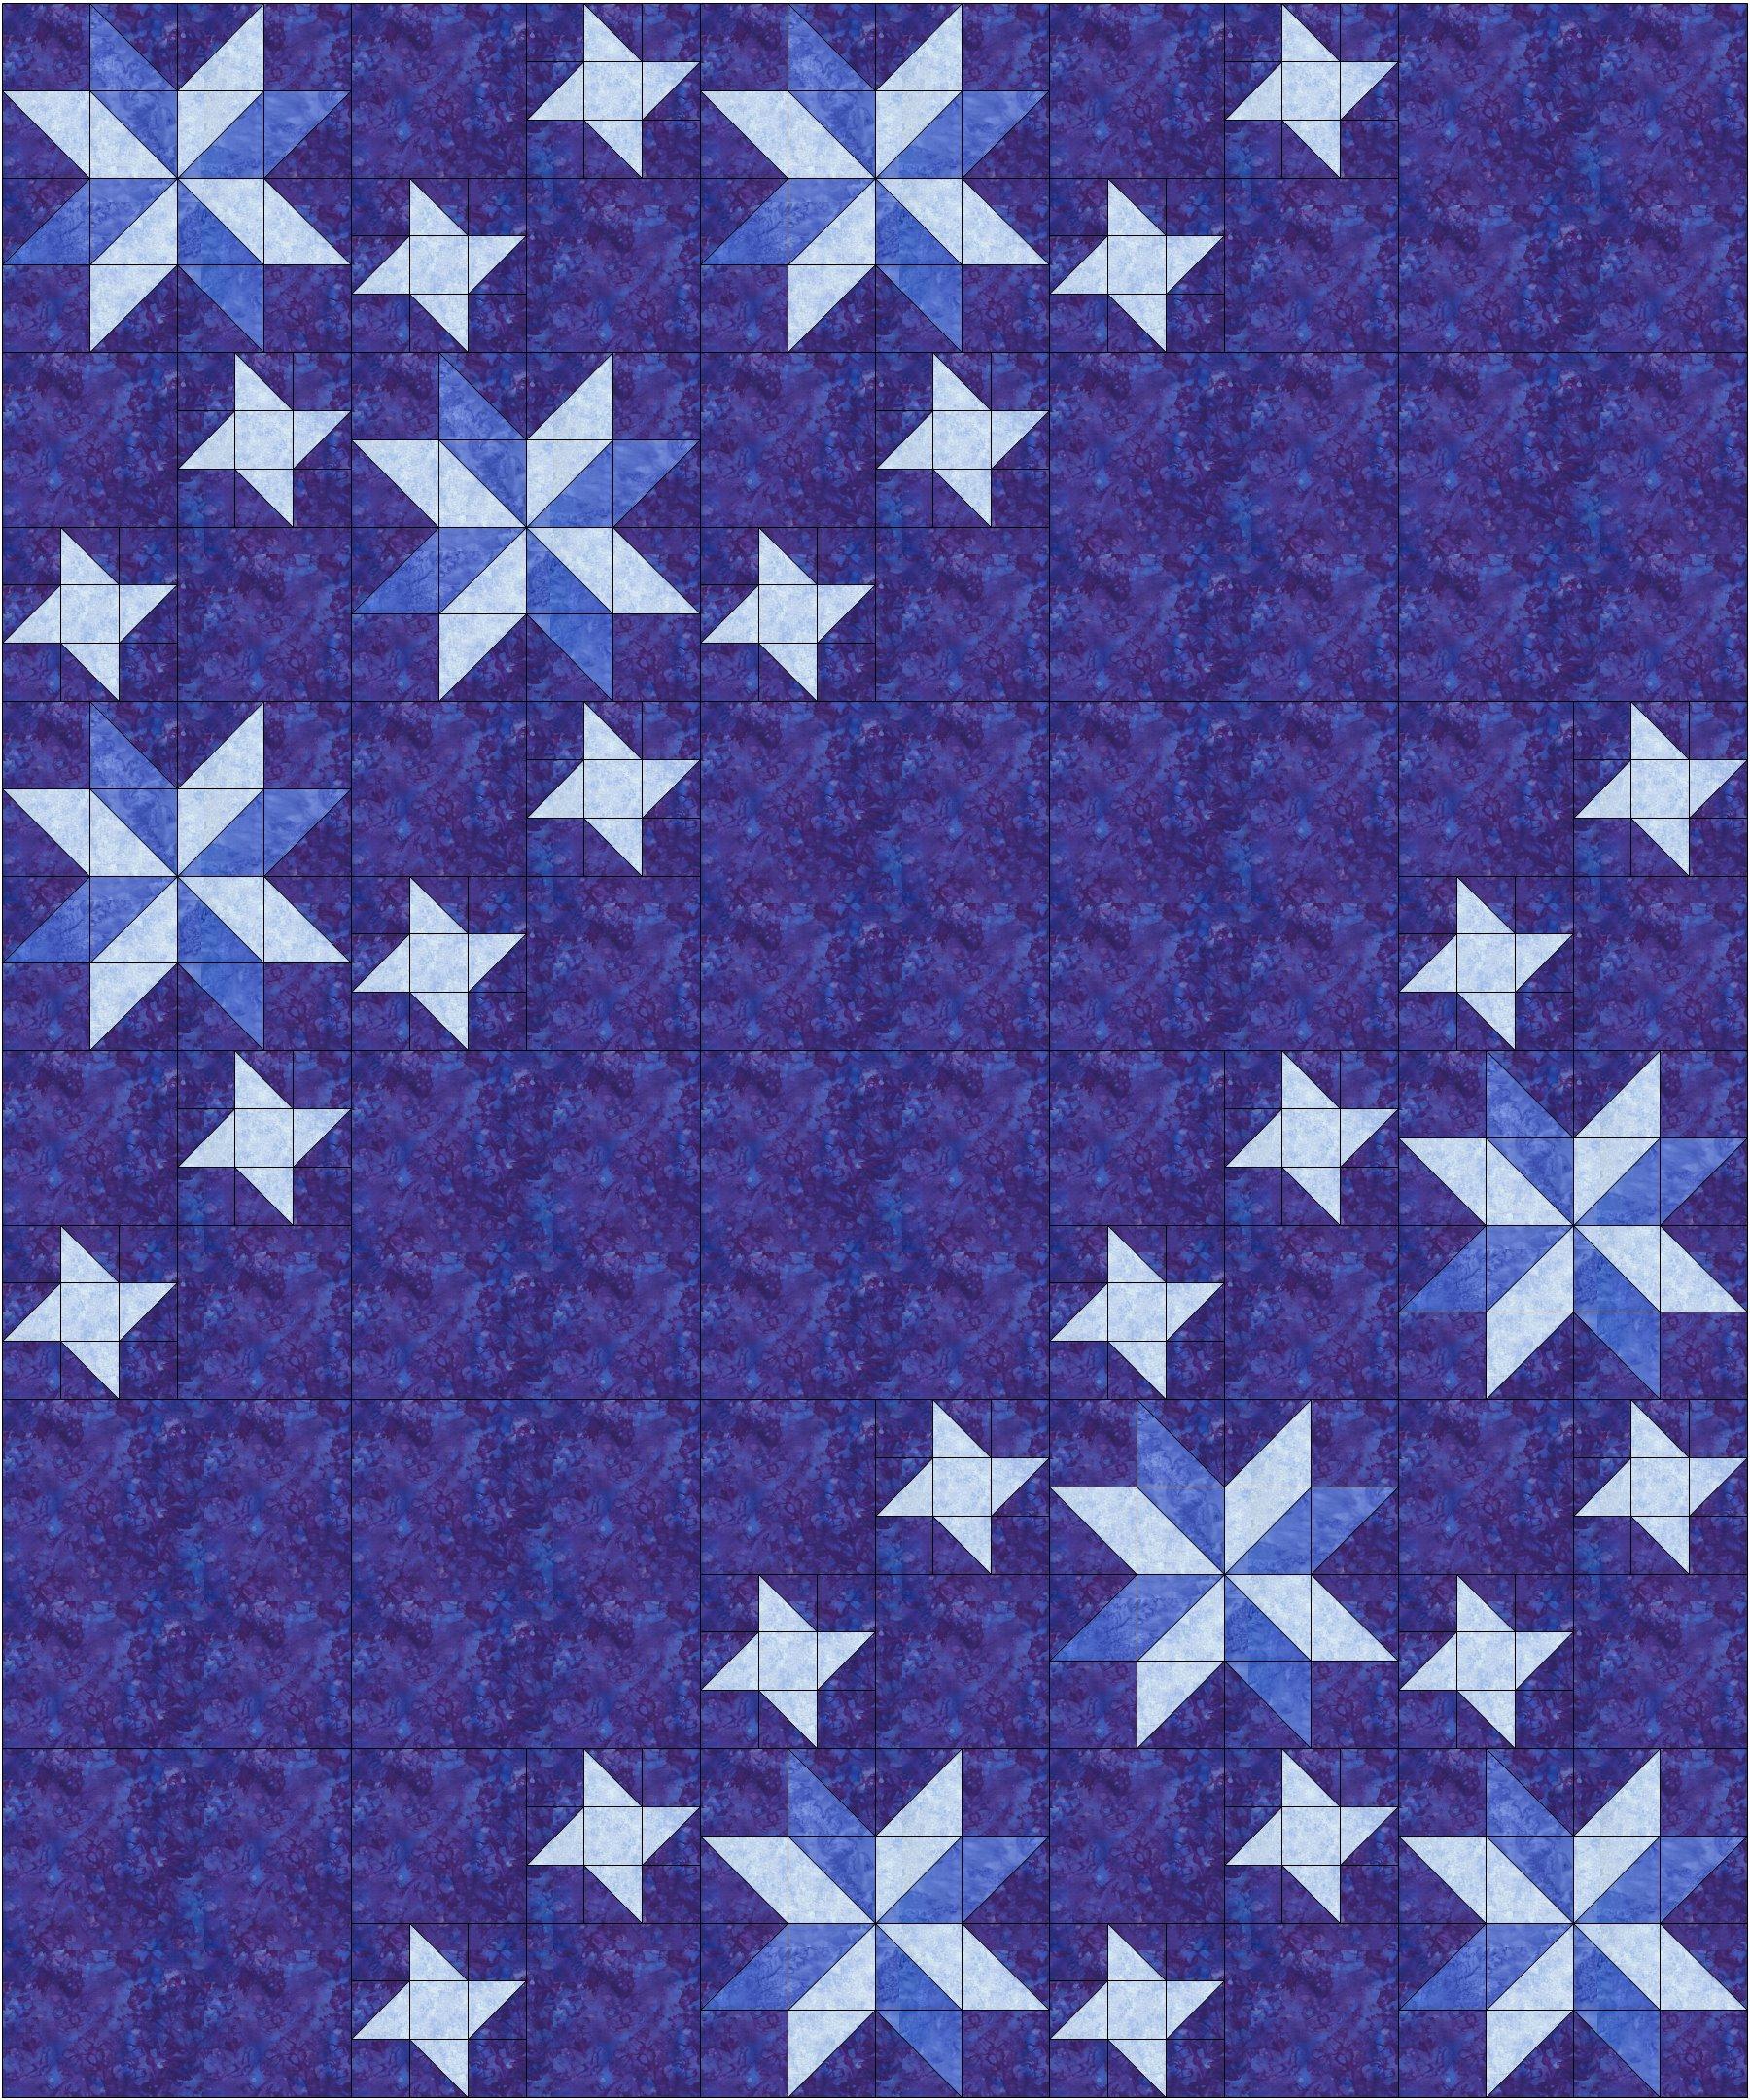 Big_n_Bright blue quilt